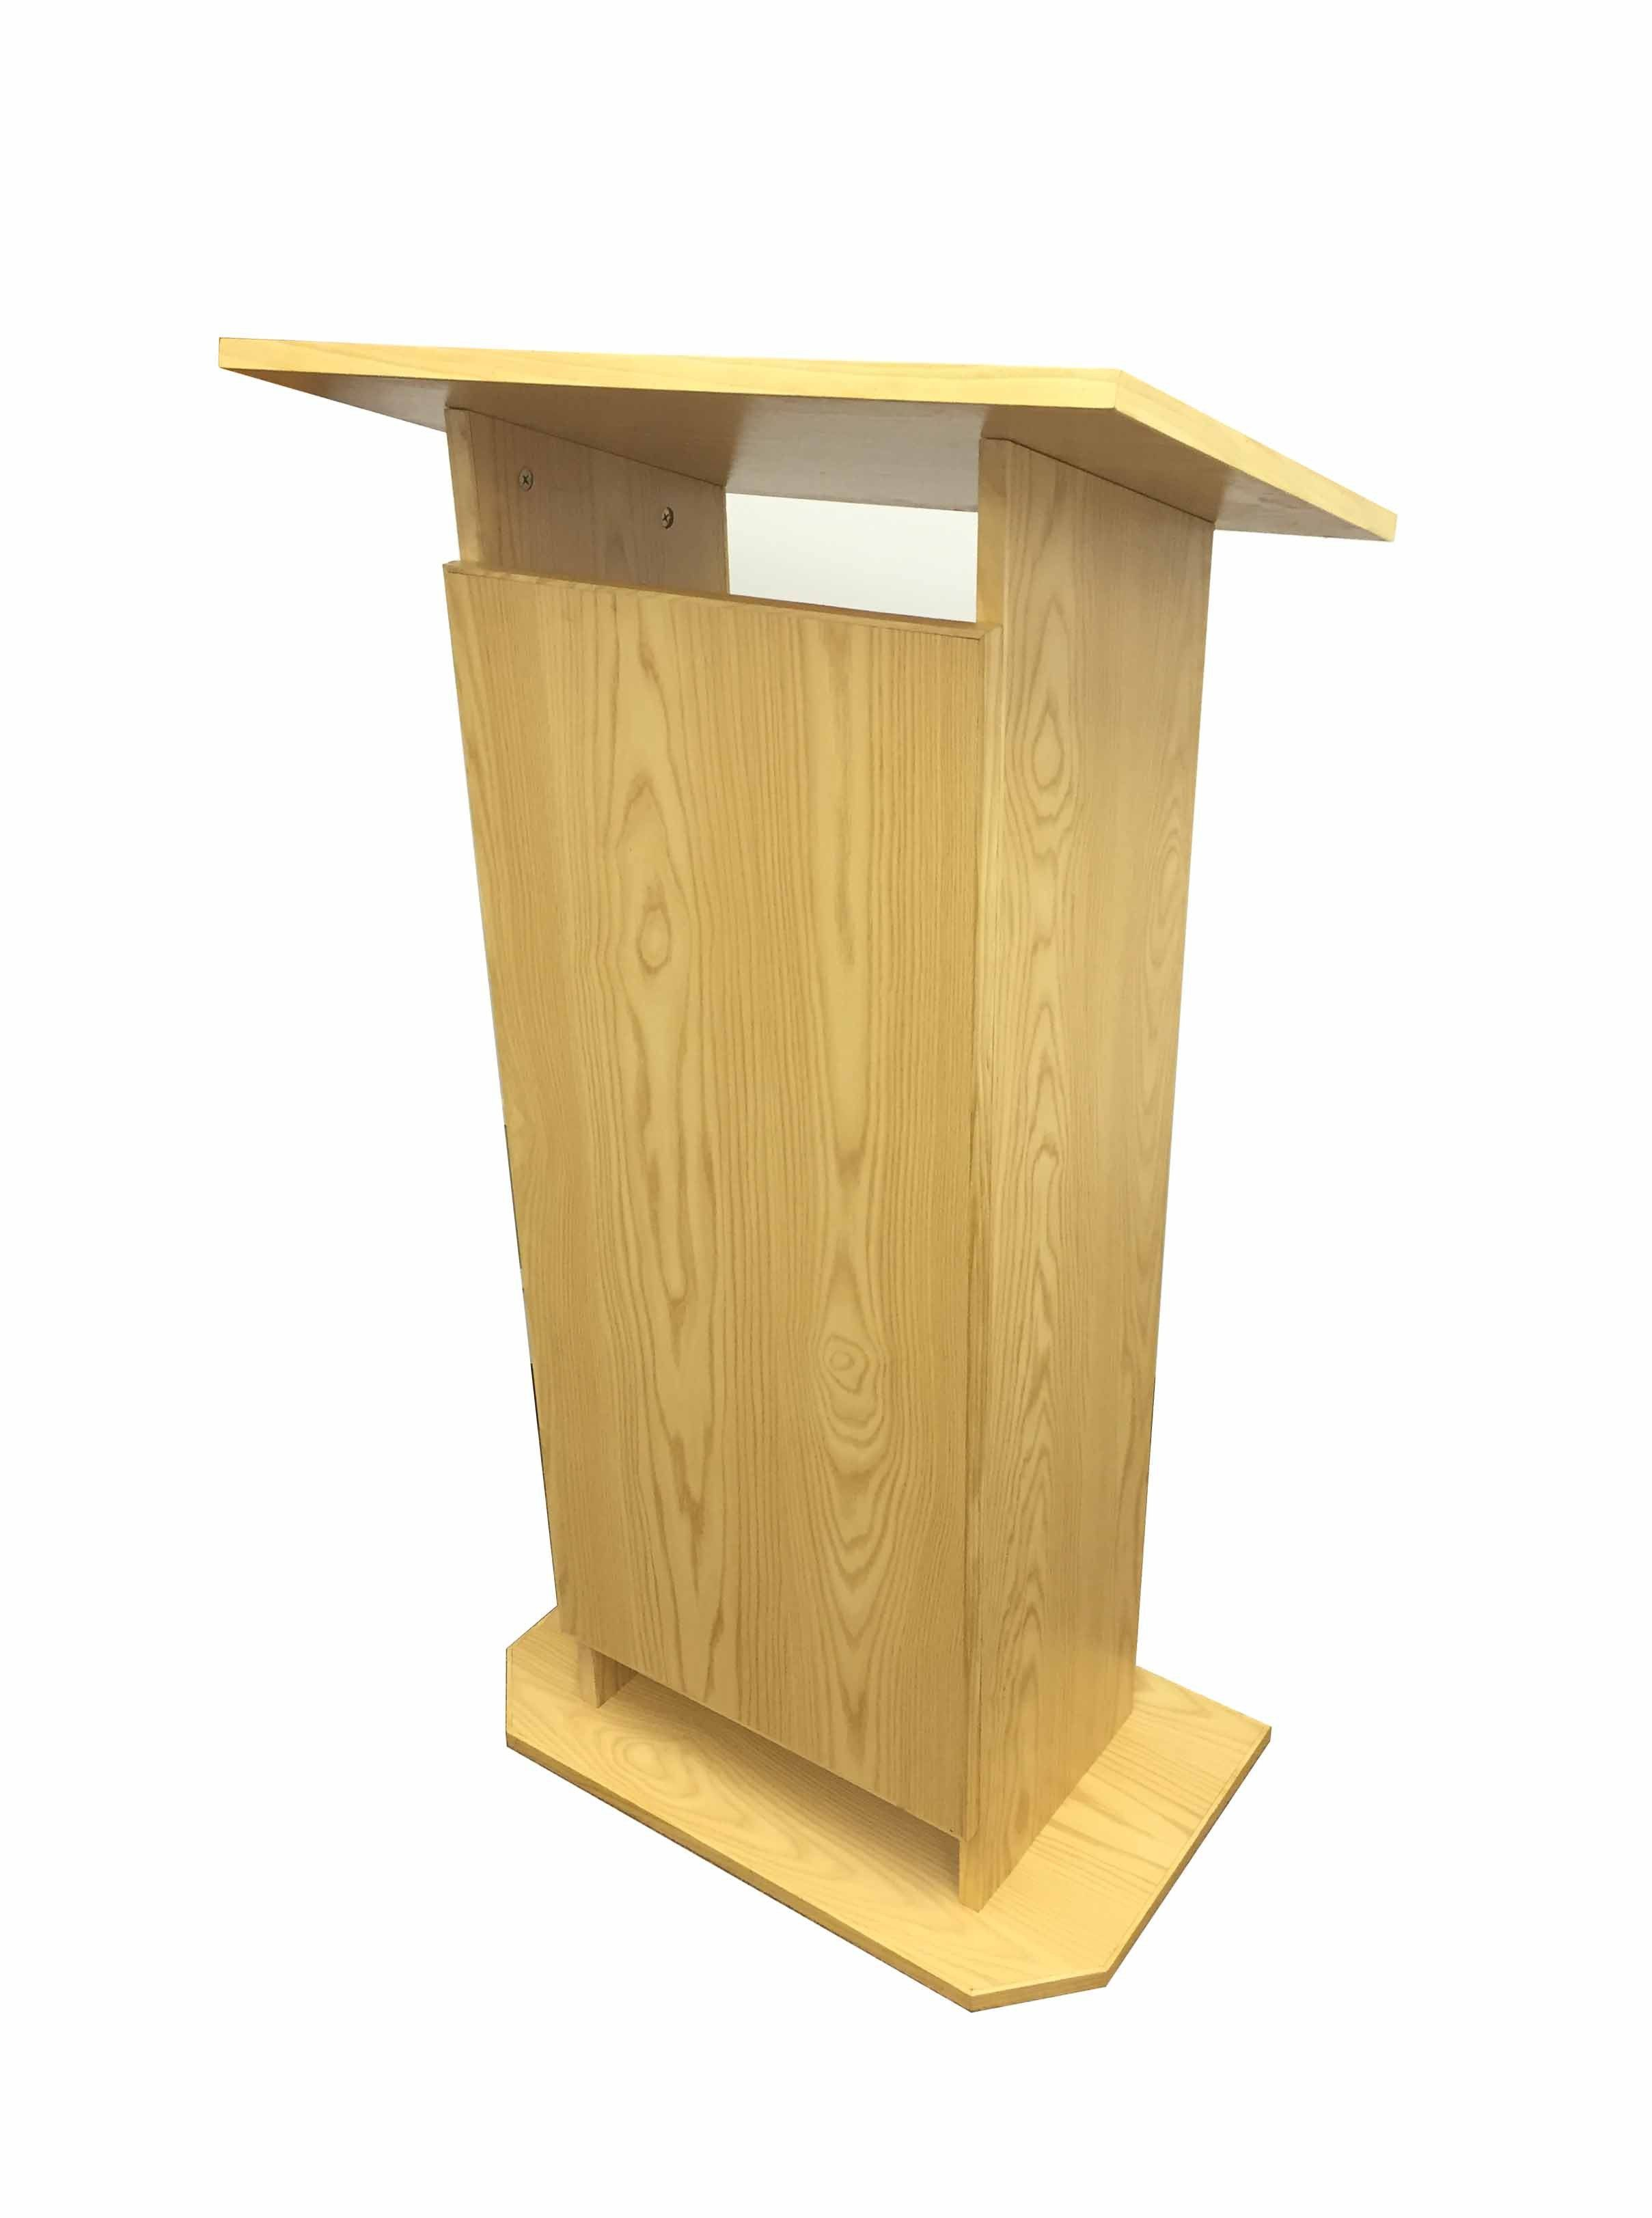 Wood Mdf Podium Pulpit Lectern Reception 14302 Golden Oak Wood Oak Laminate Lectern